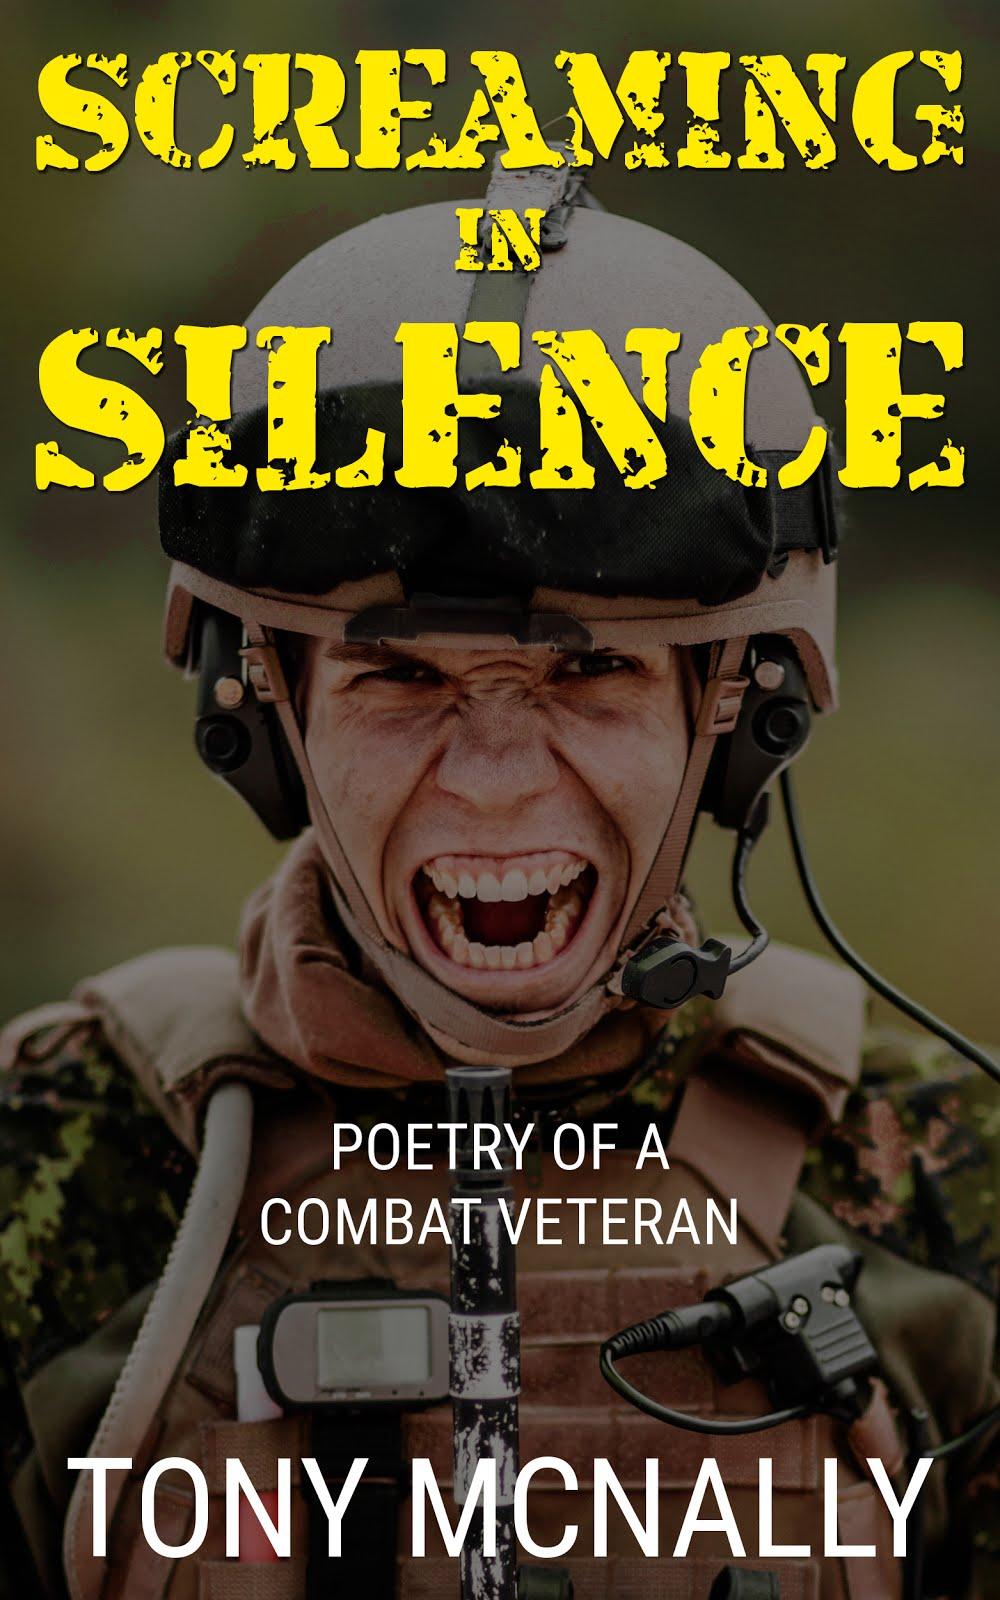 My book of PTSD poetry